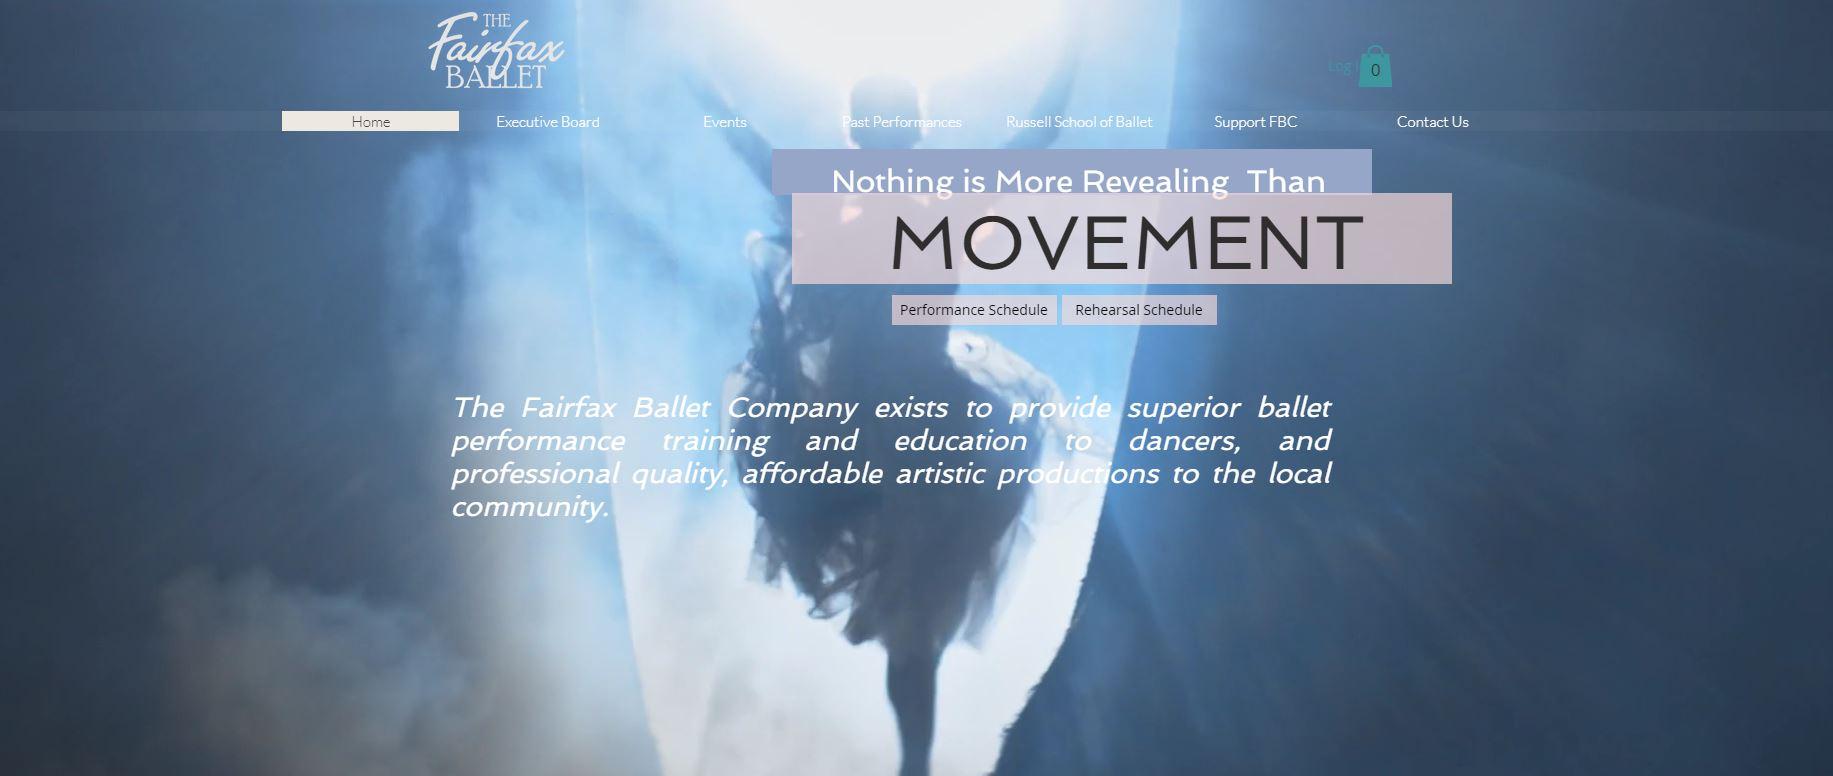 Fairfax Ballet